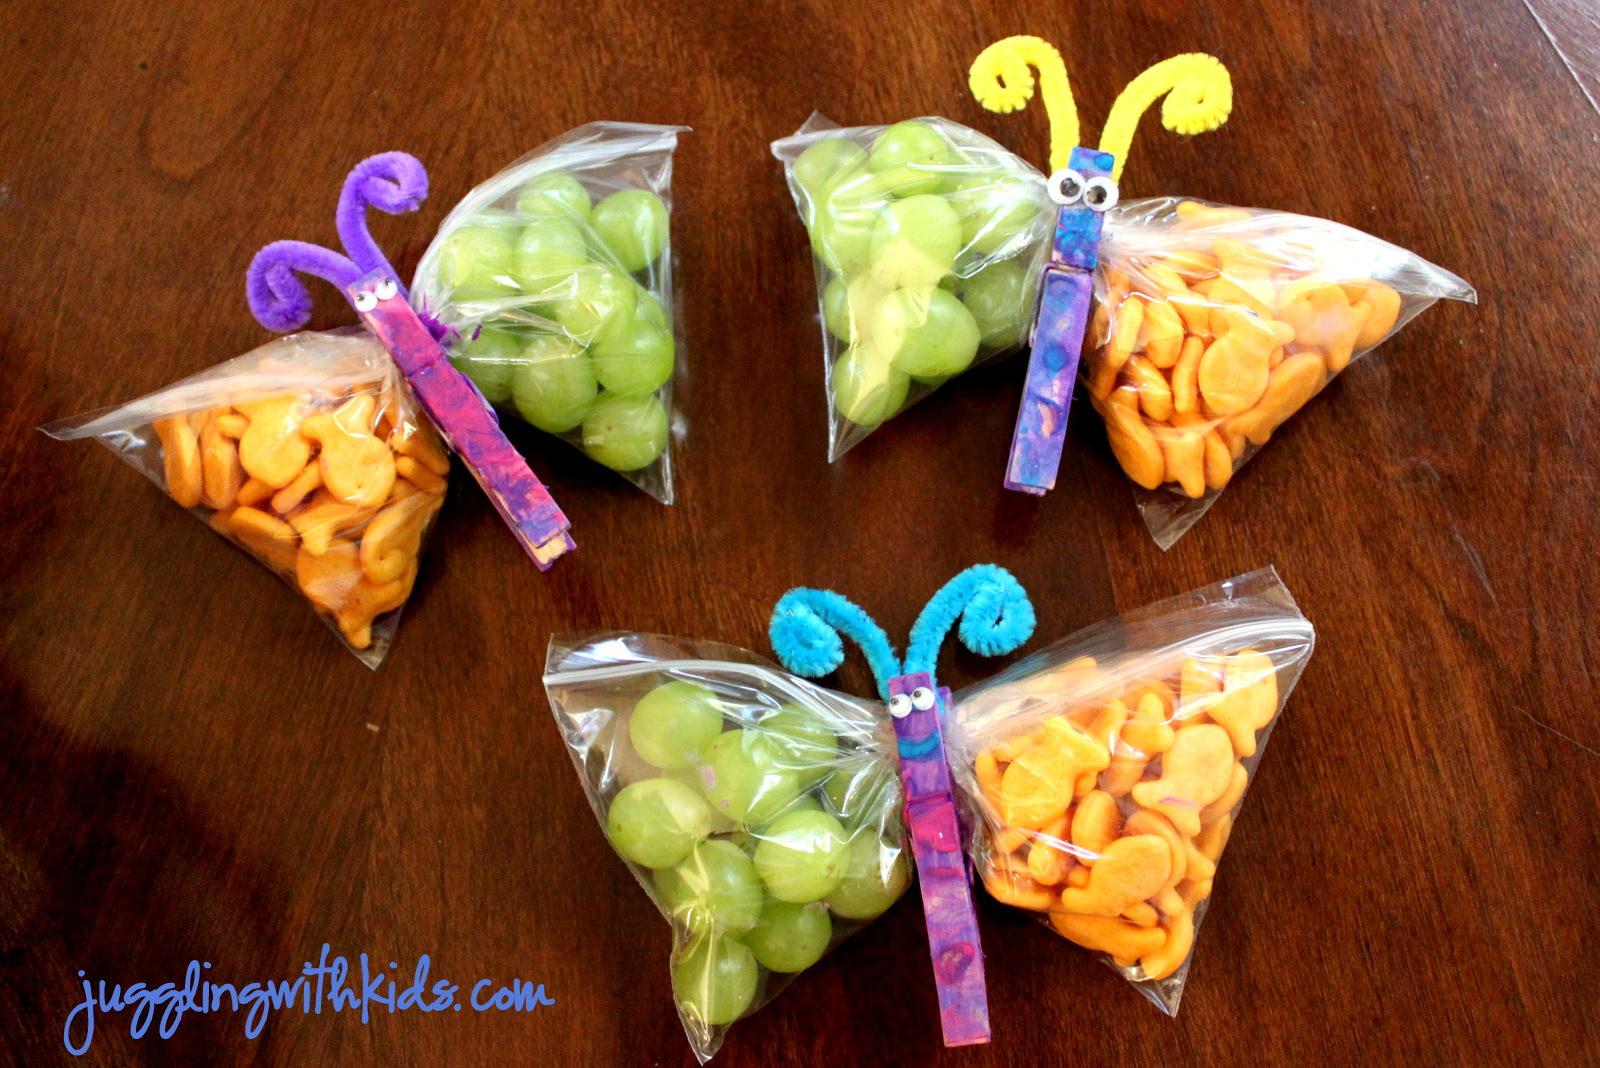 back-to-school snack ideas